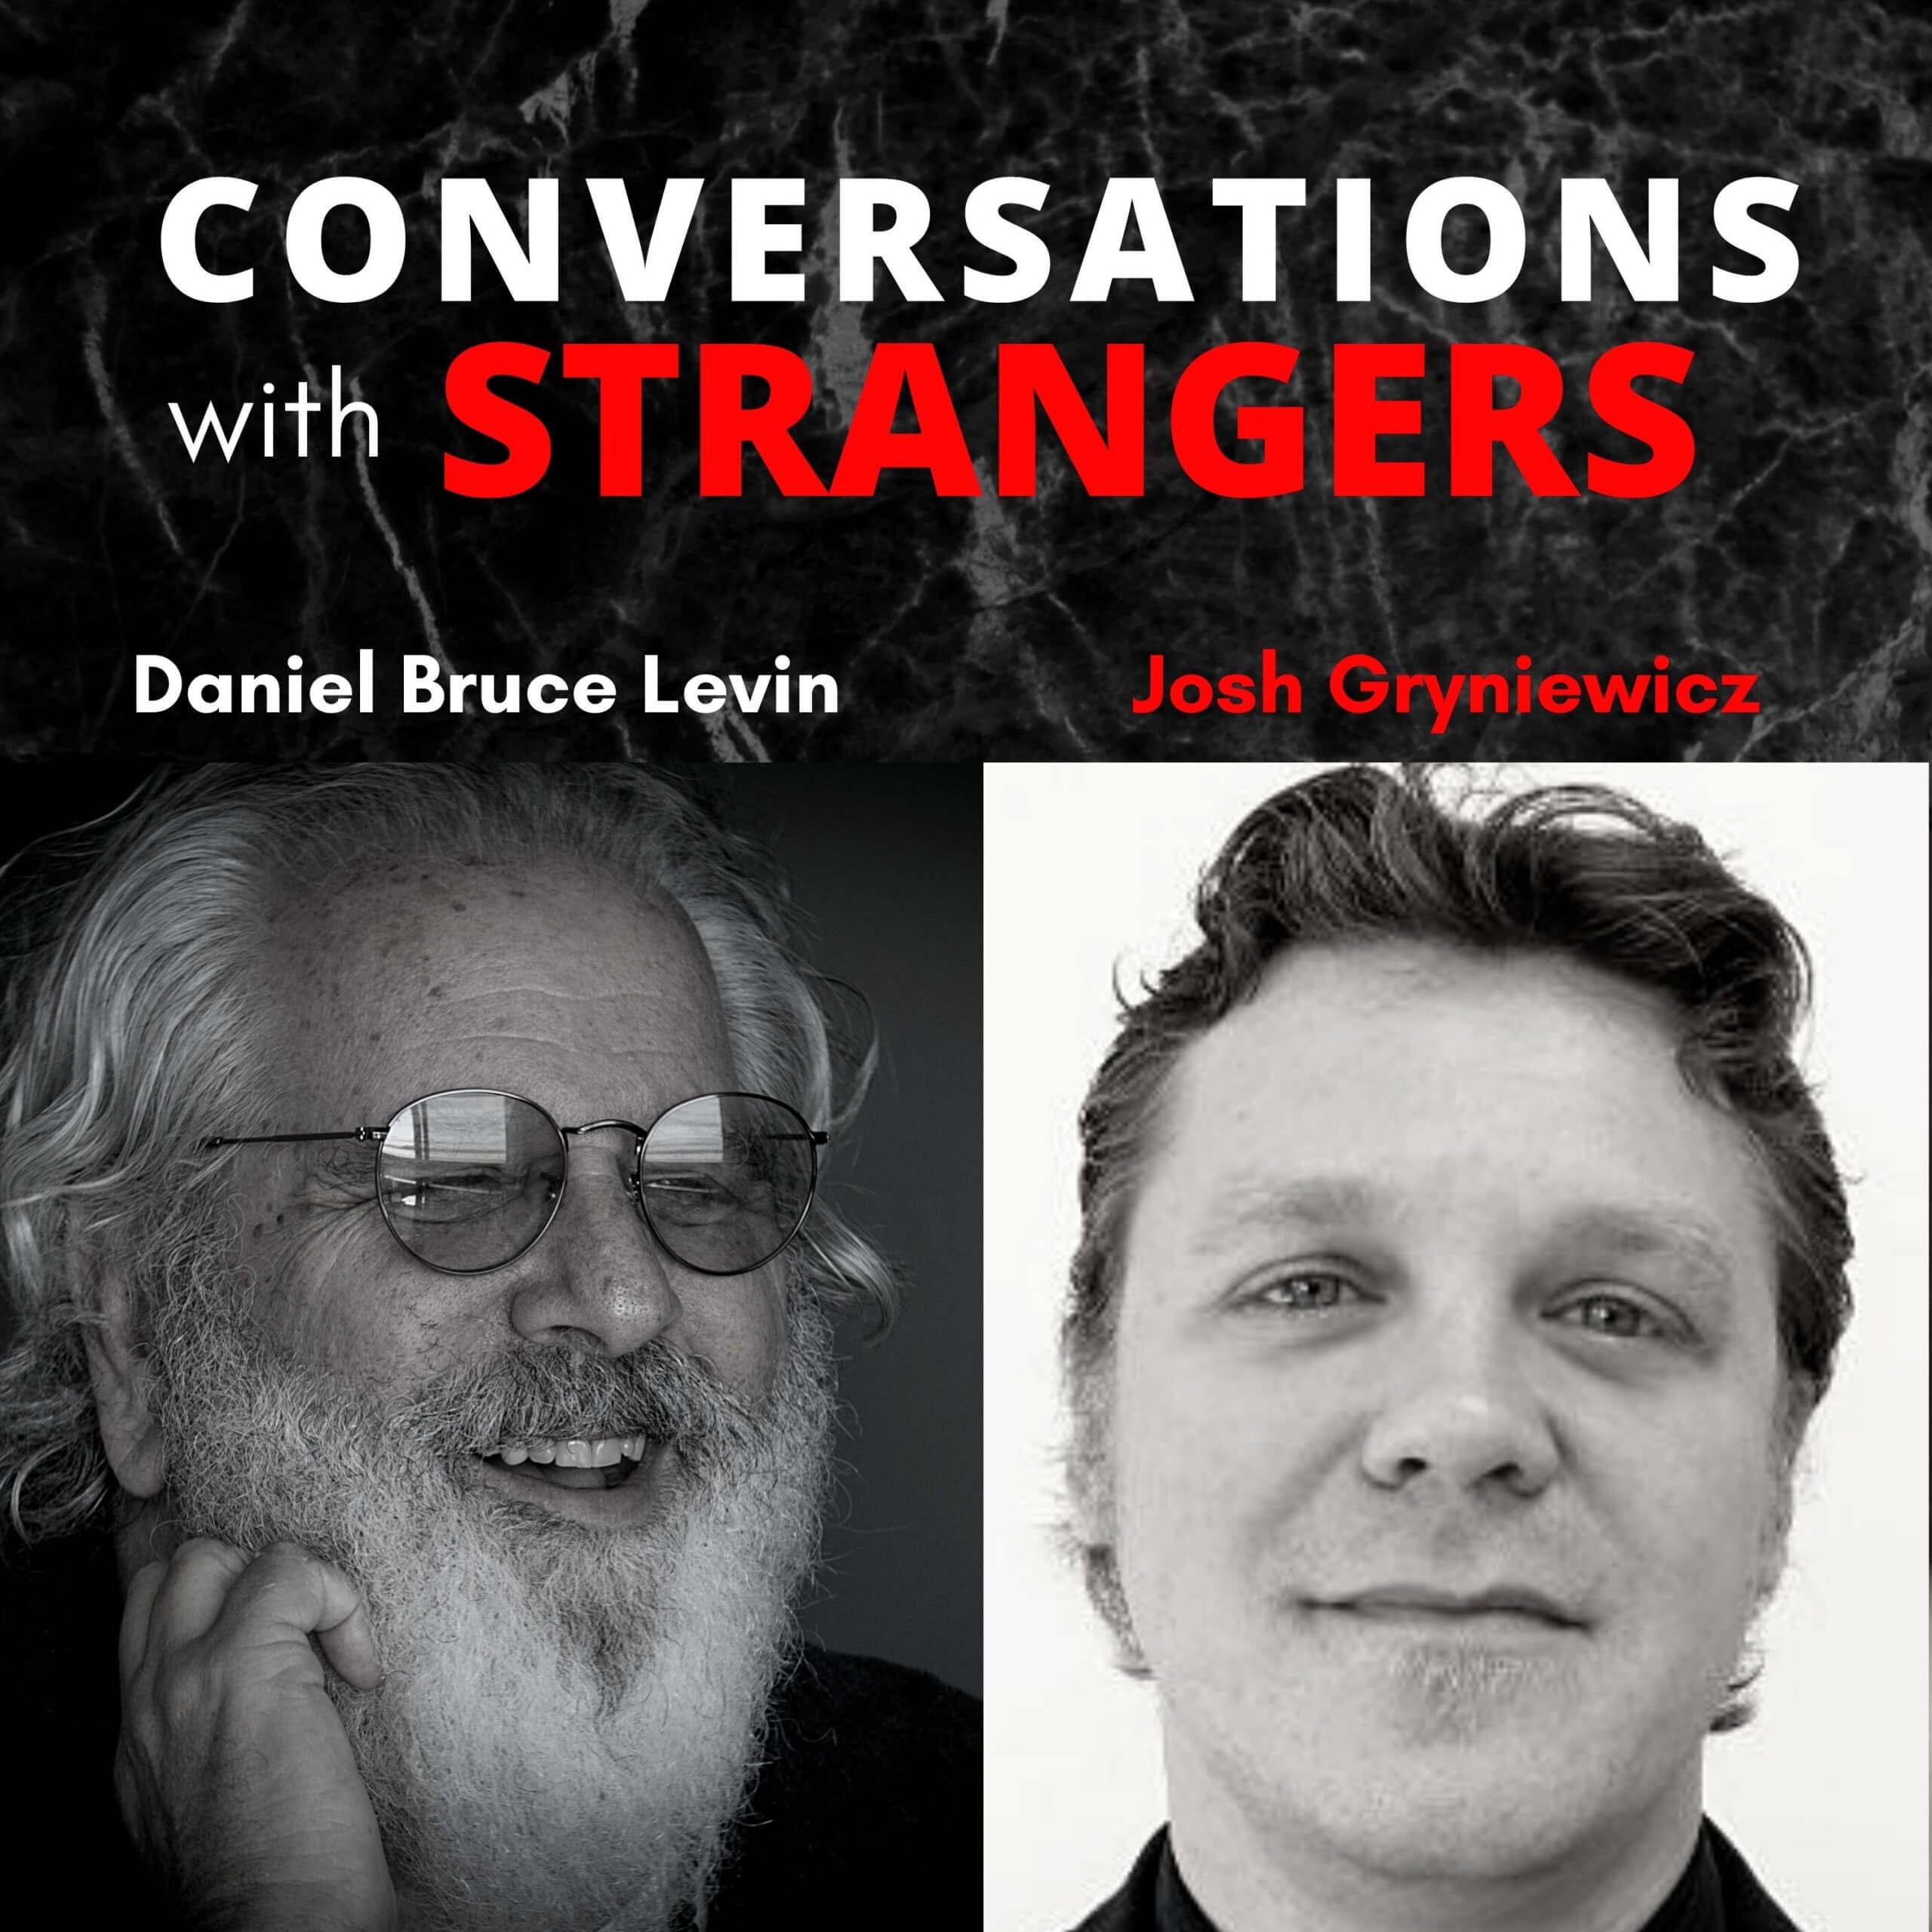 Conversations with Strangers feat. Josh Gryniewicz